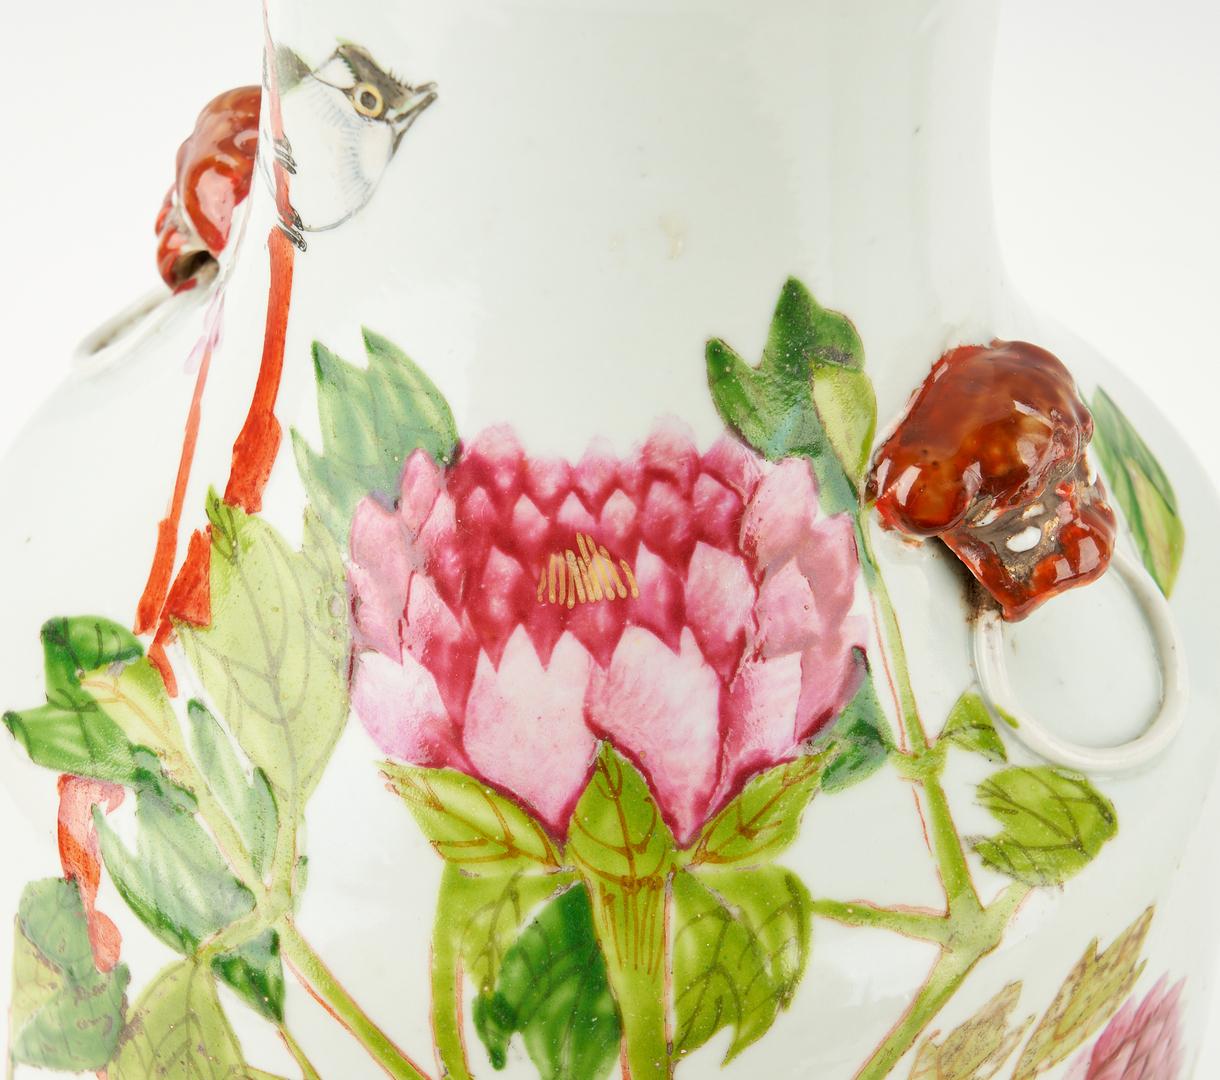 Lot 1171: Chinese Famille Rose Porcelain Vase and Jar